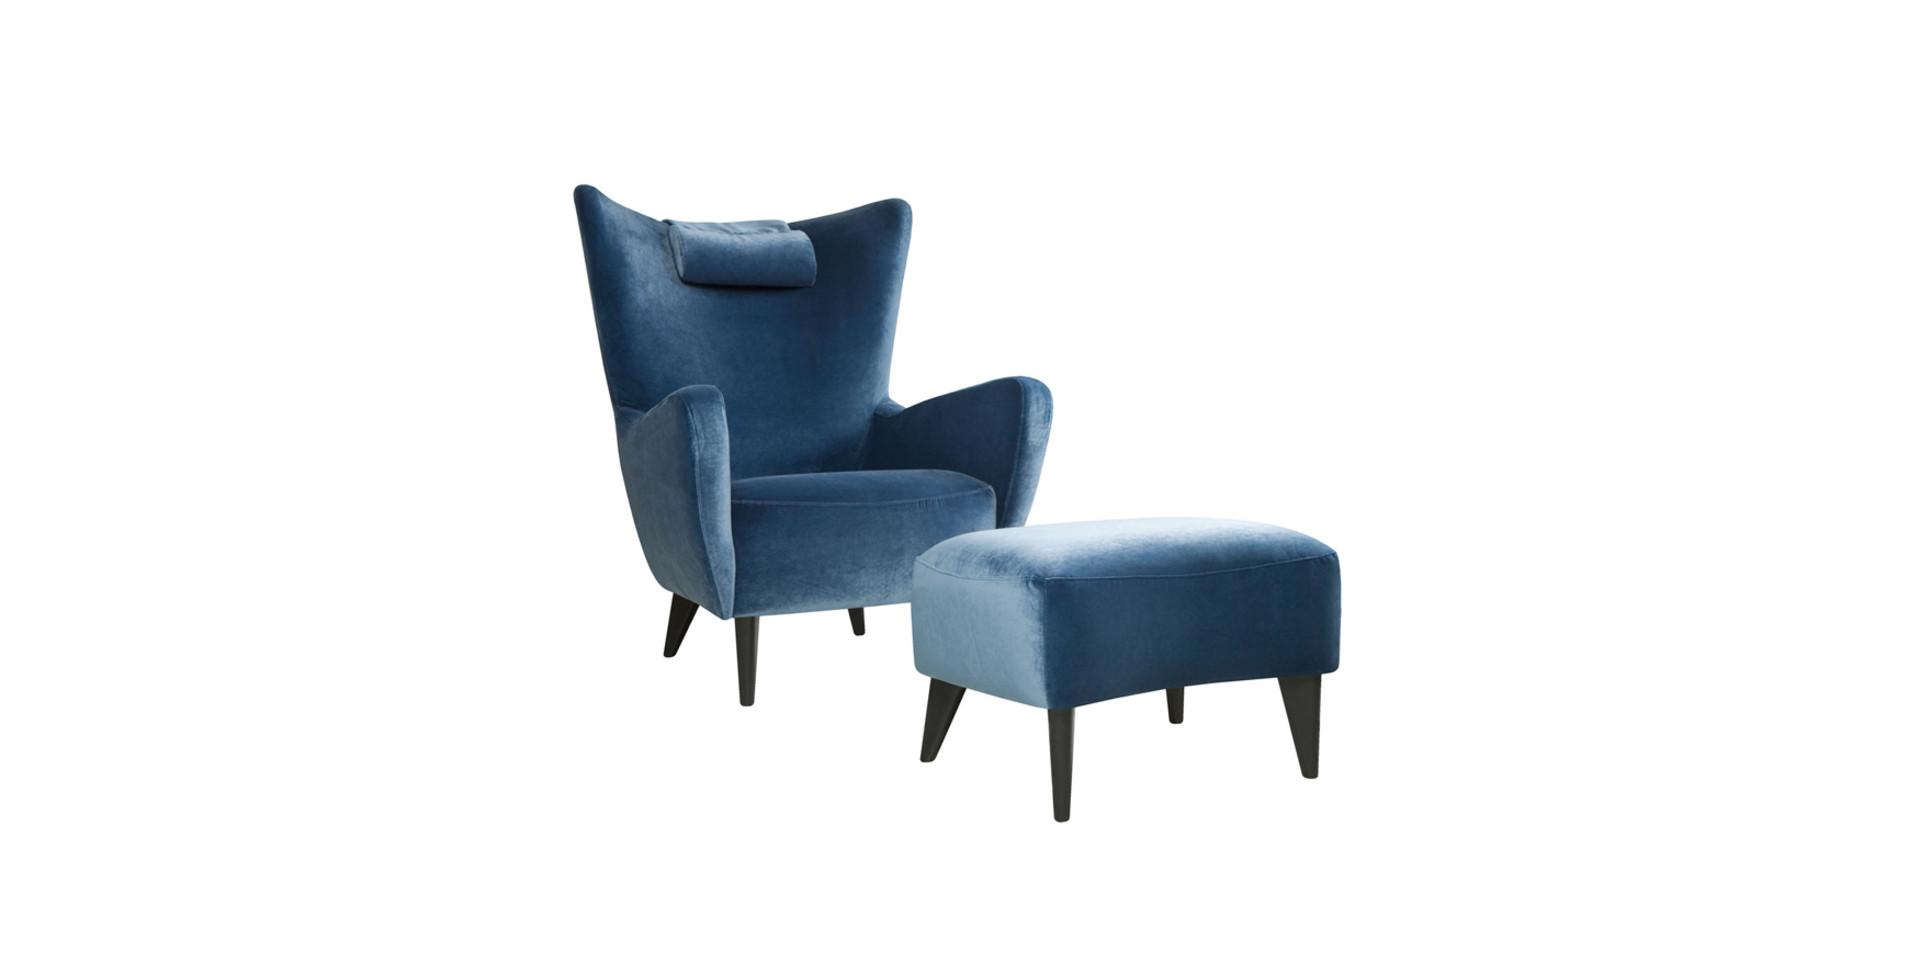 ELSA_armchair_footstool_headrest_classic_velvet12_navy_blue_3